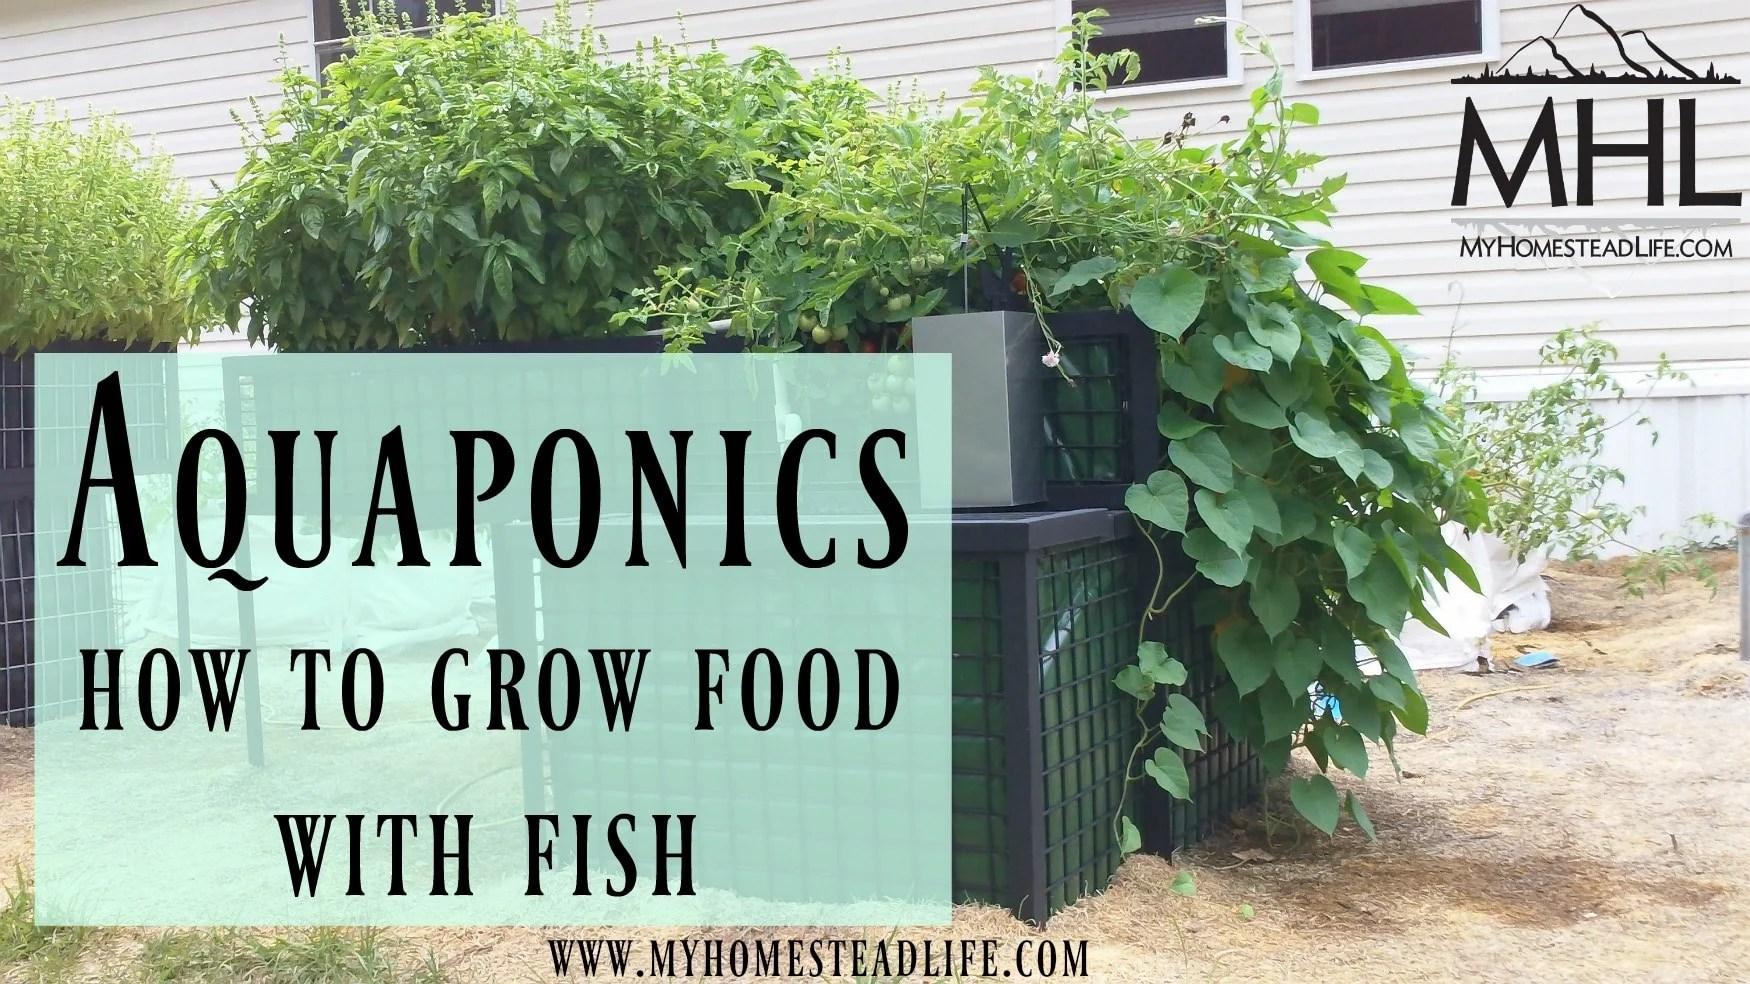 Aquaponics- how to Grow Food With Fish